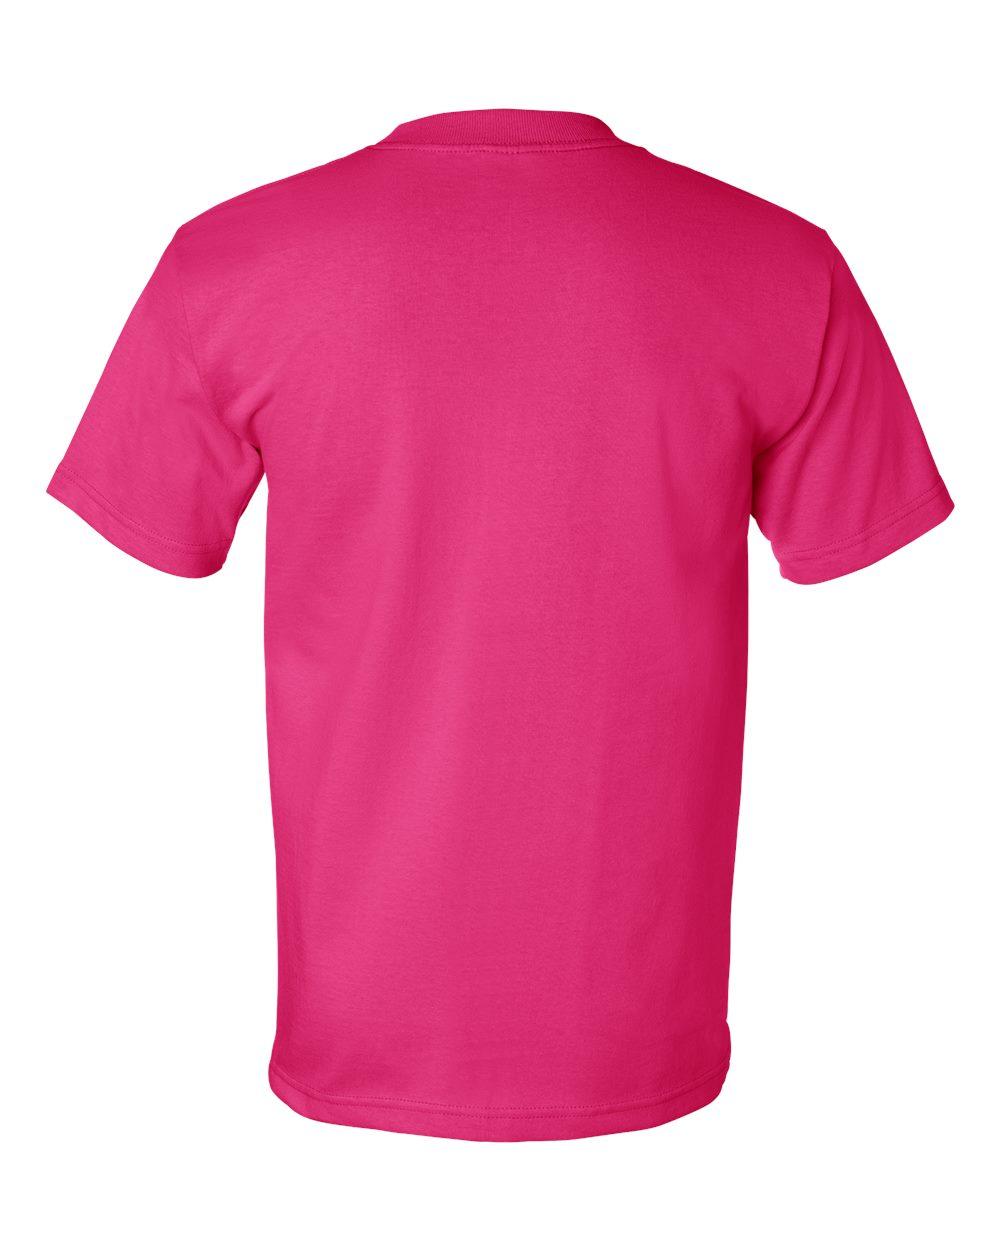 Bayside-Mens-Cotton-Blank-USA-Made-Short-Sleeve-T-Shirt-5100-up-to-5XL thumbnail 13